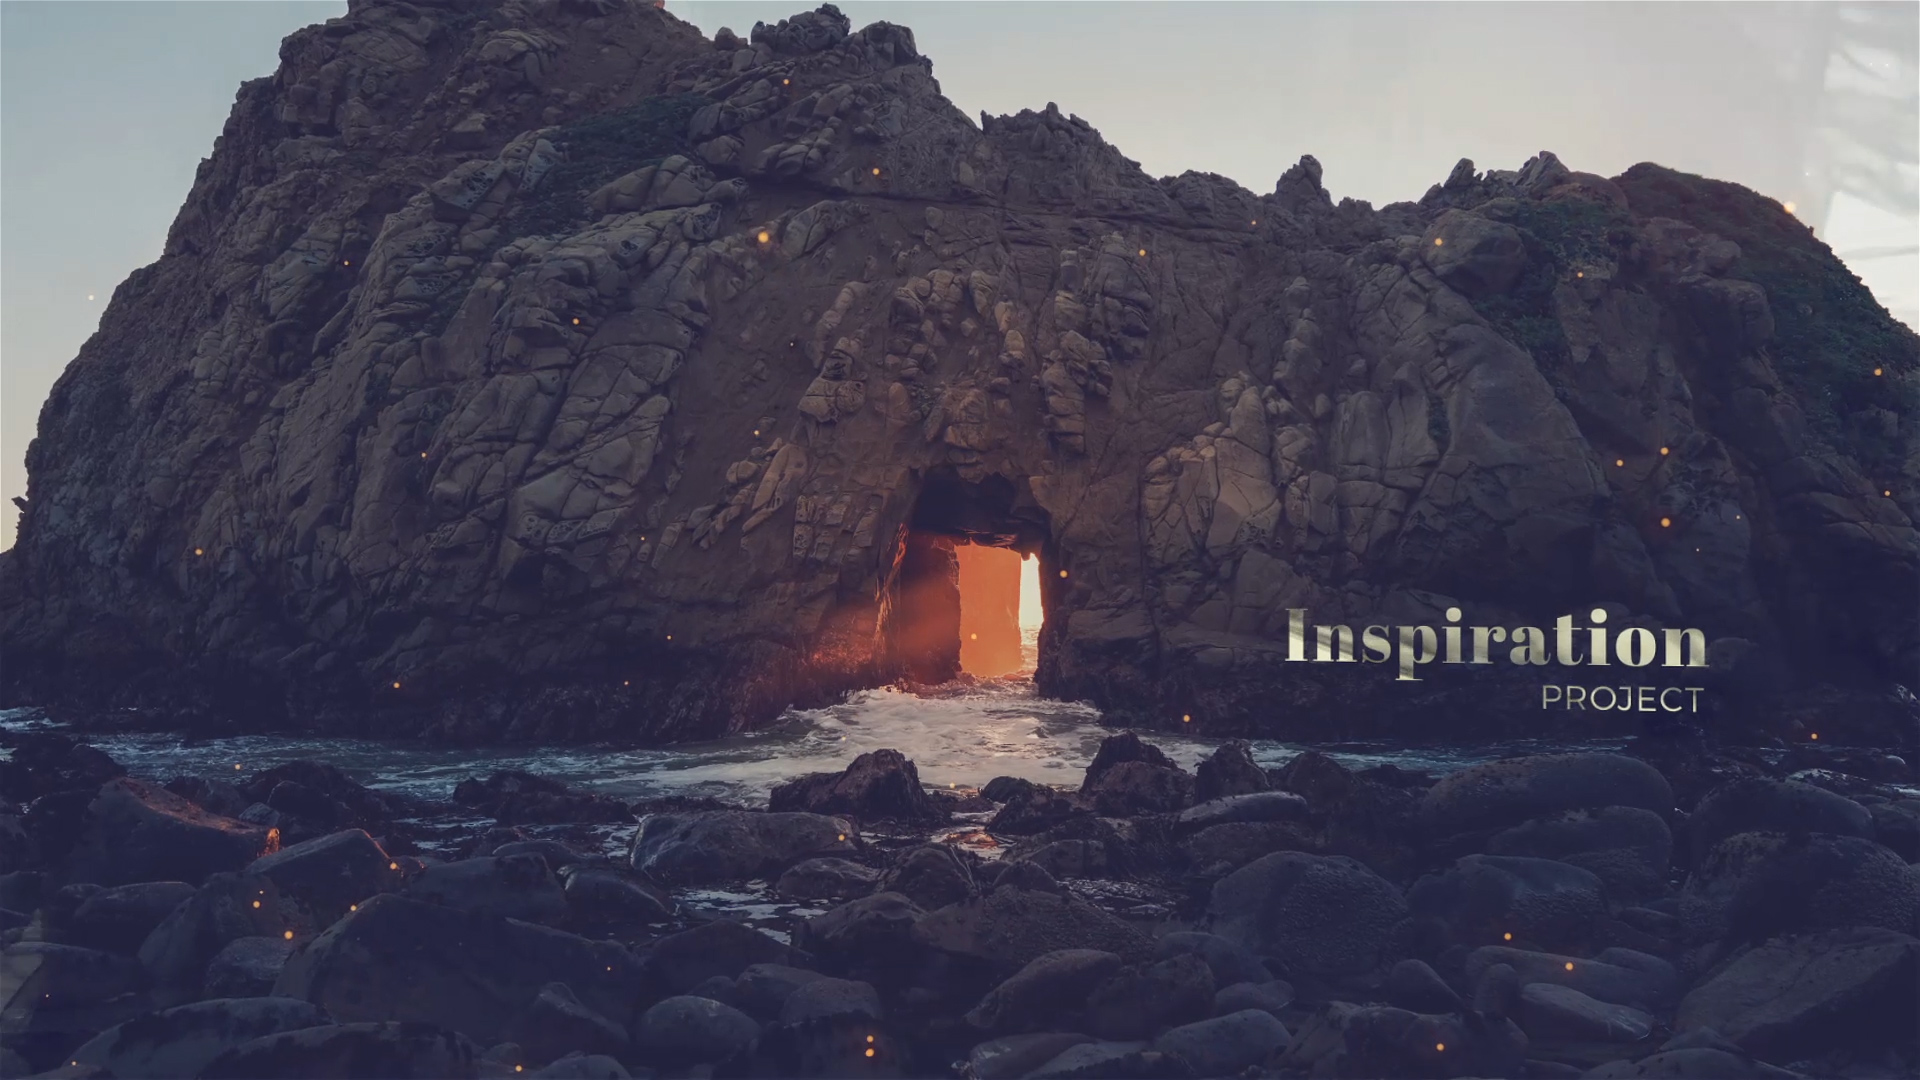 inspiring ae template for slideshows